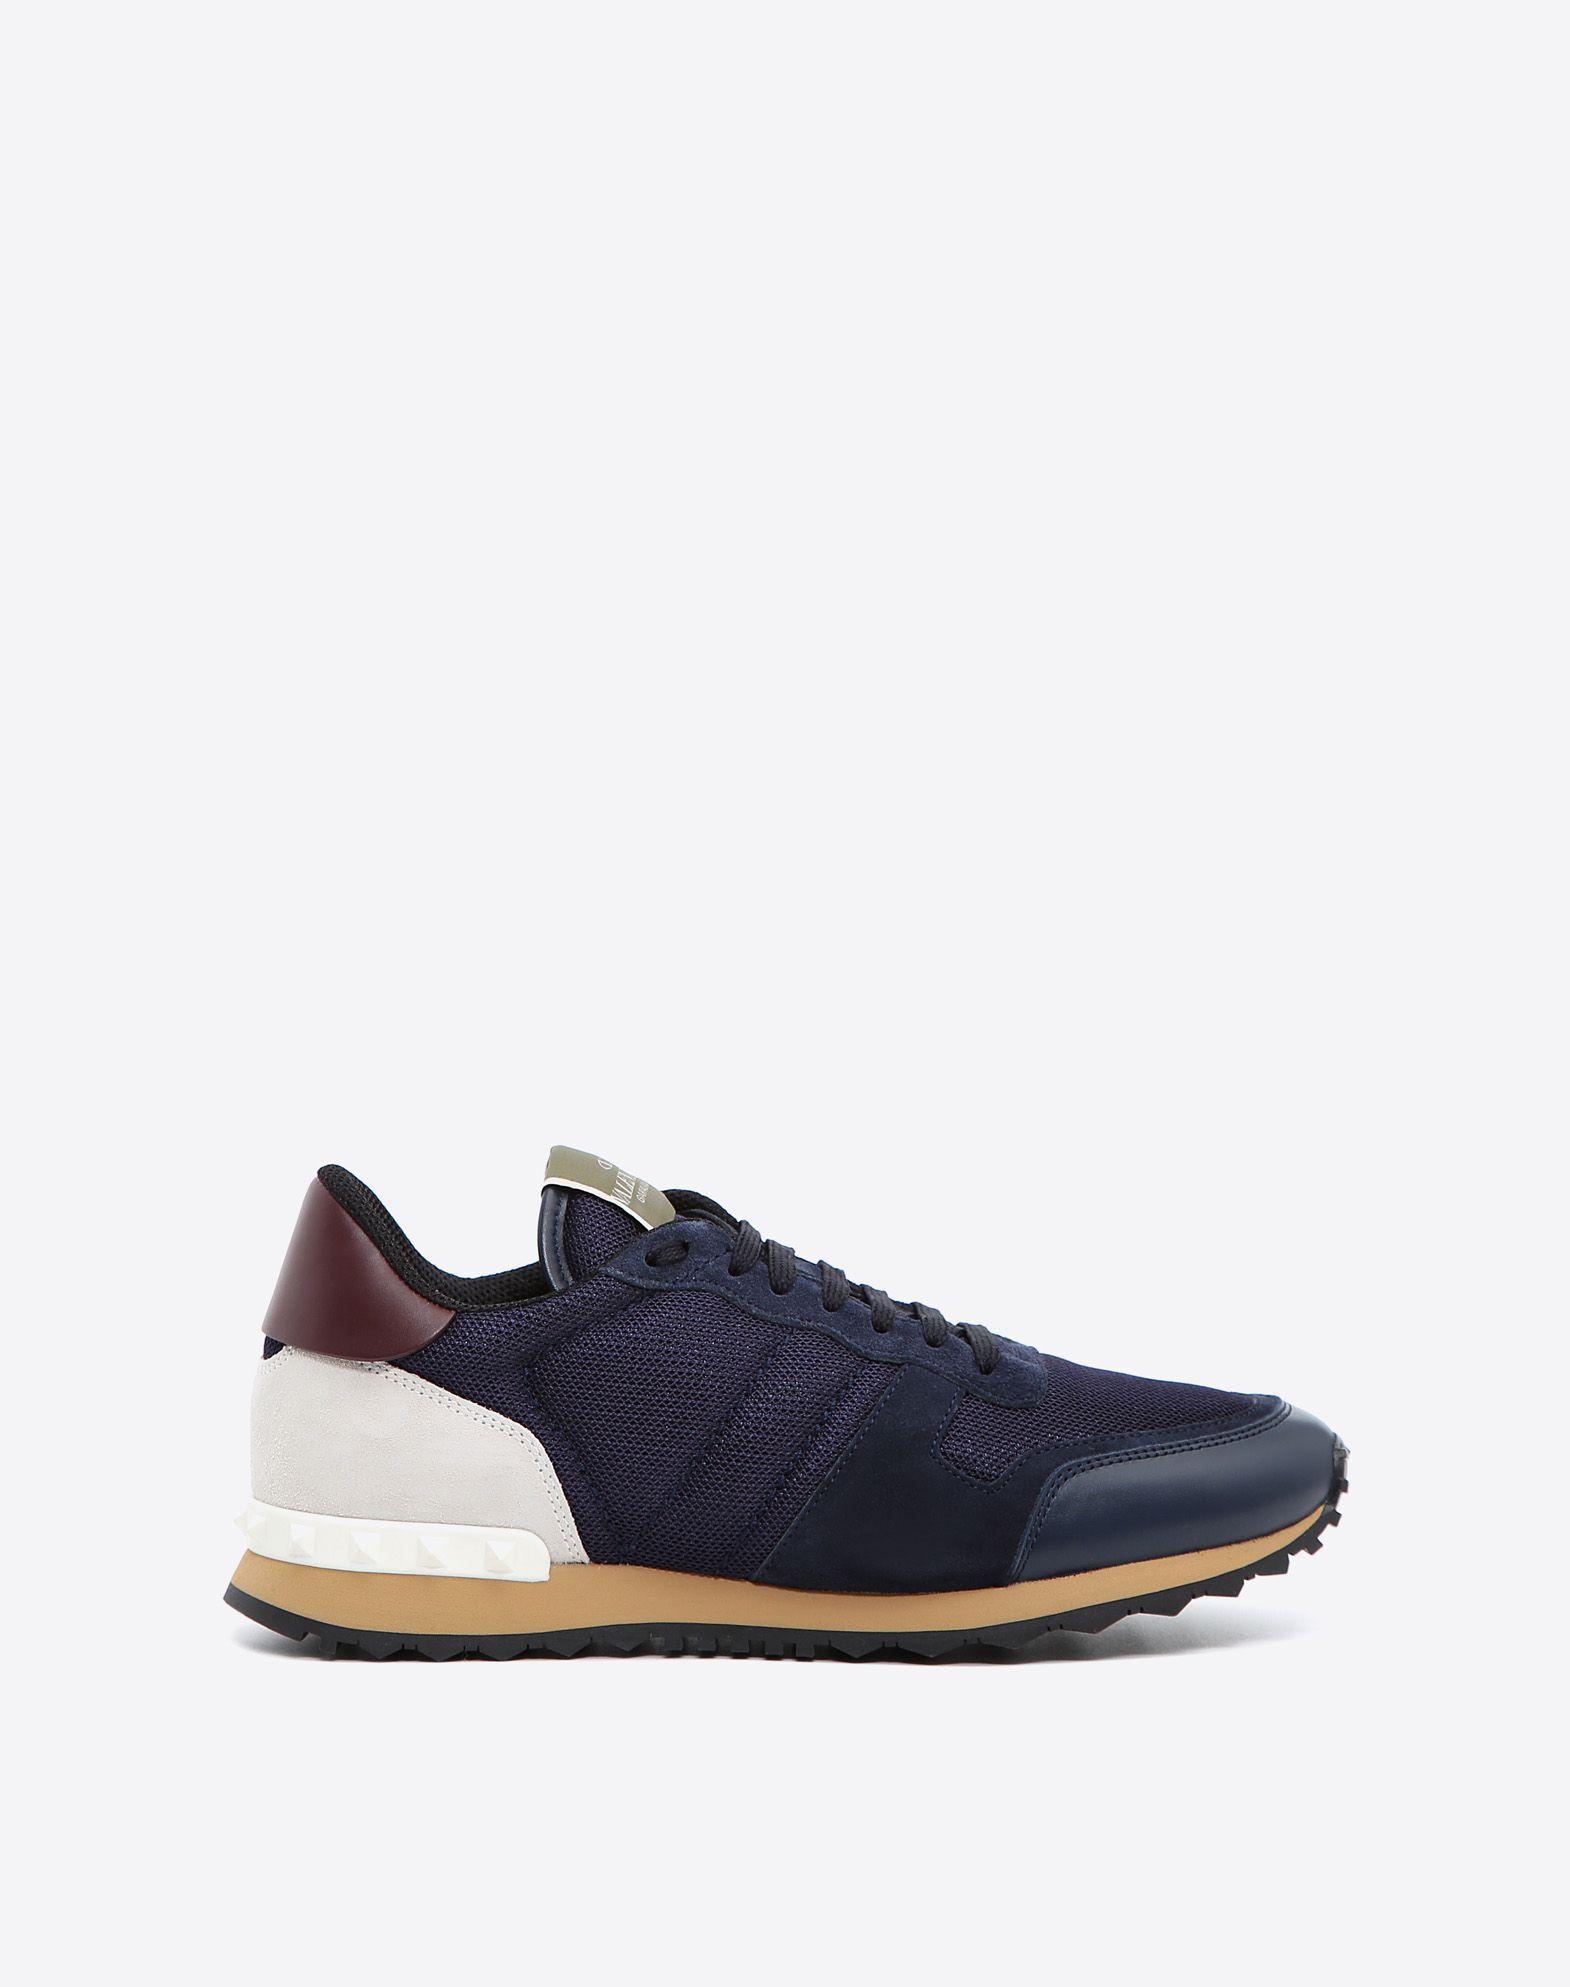 VALENTINO GARAVANI UOMO MY2S0723TCV H07 Sneaker U f